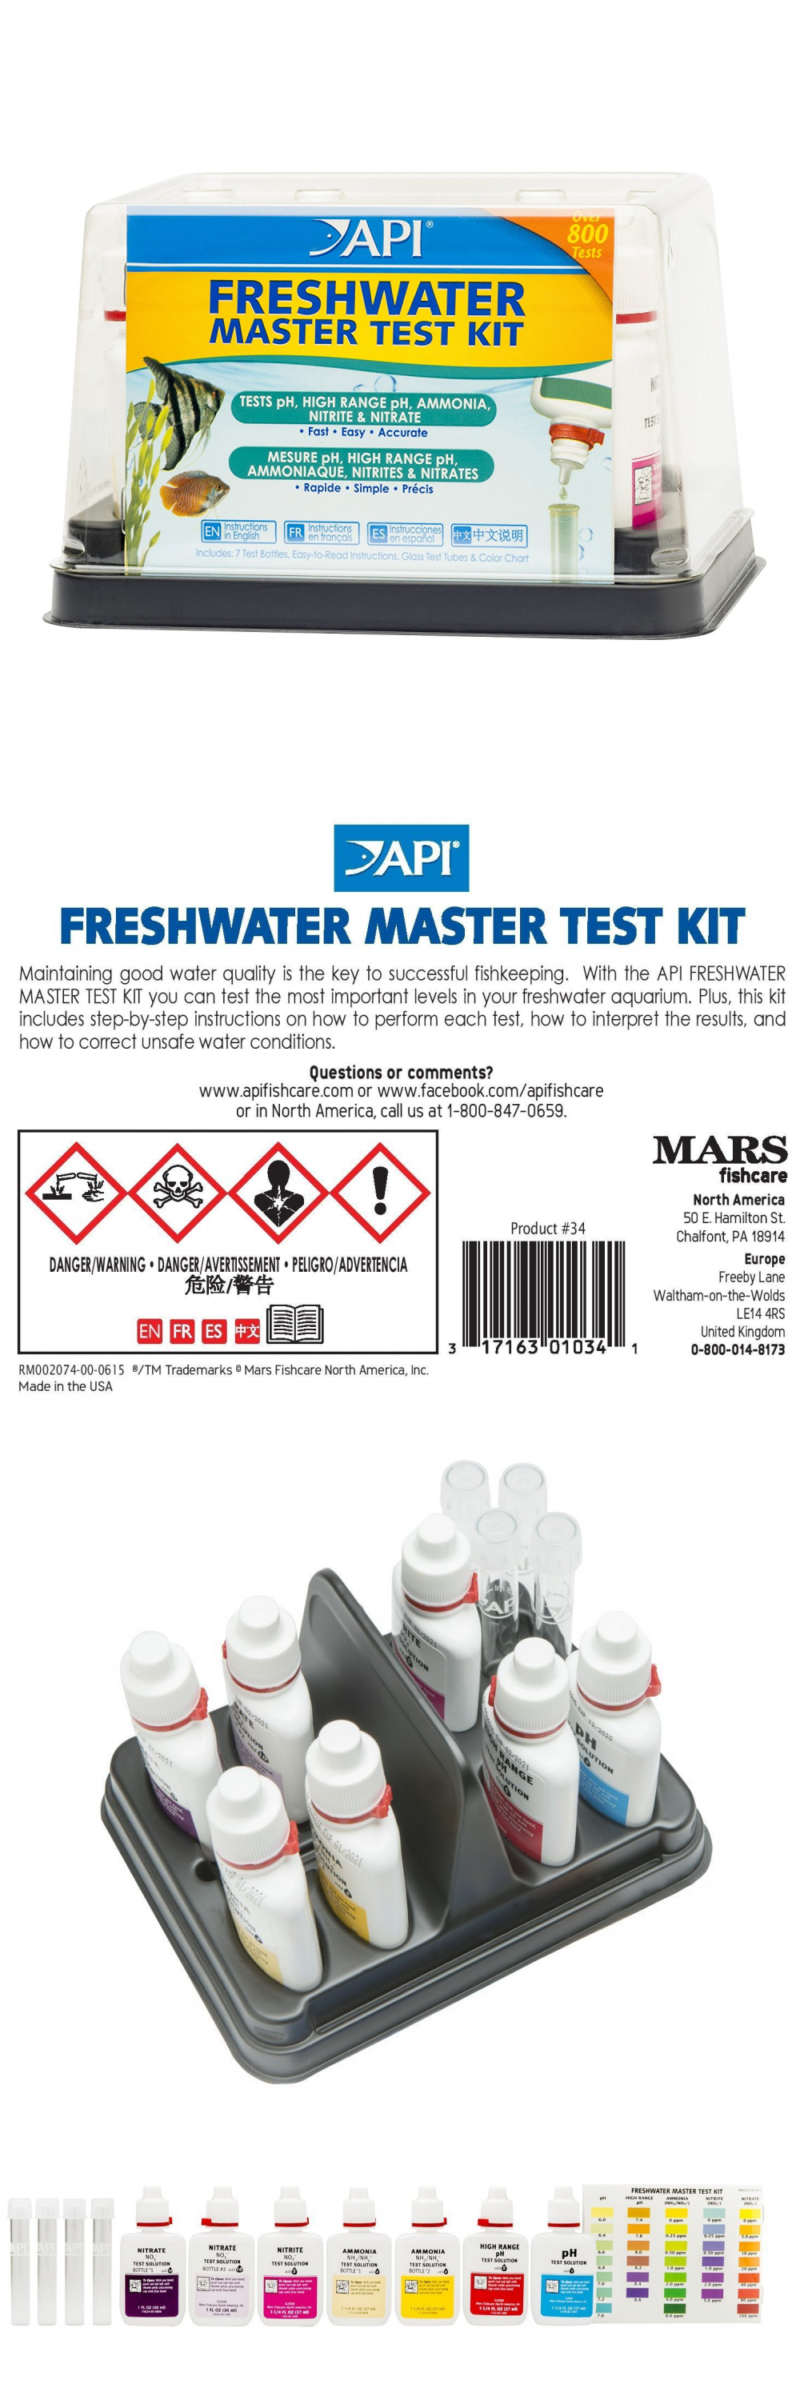 Freshwater aquarium fish high ph - Water Tests And Treatment 77659 Api Freshwater Master Test Kit Aquarium Water Tropical Fish Ph